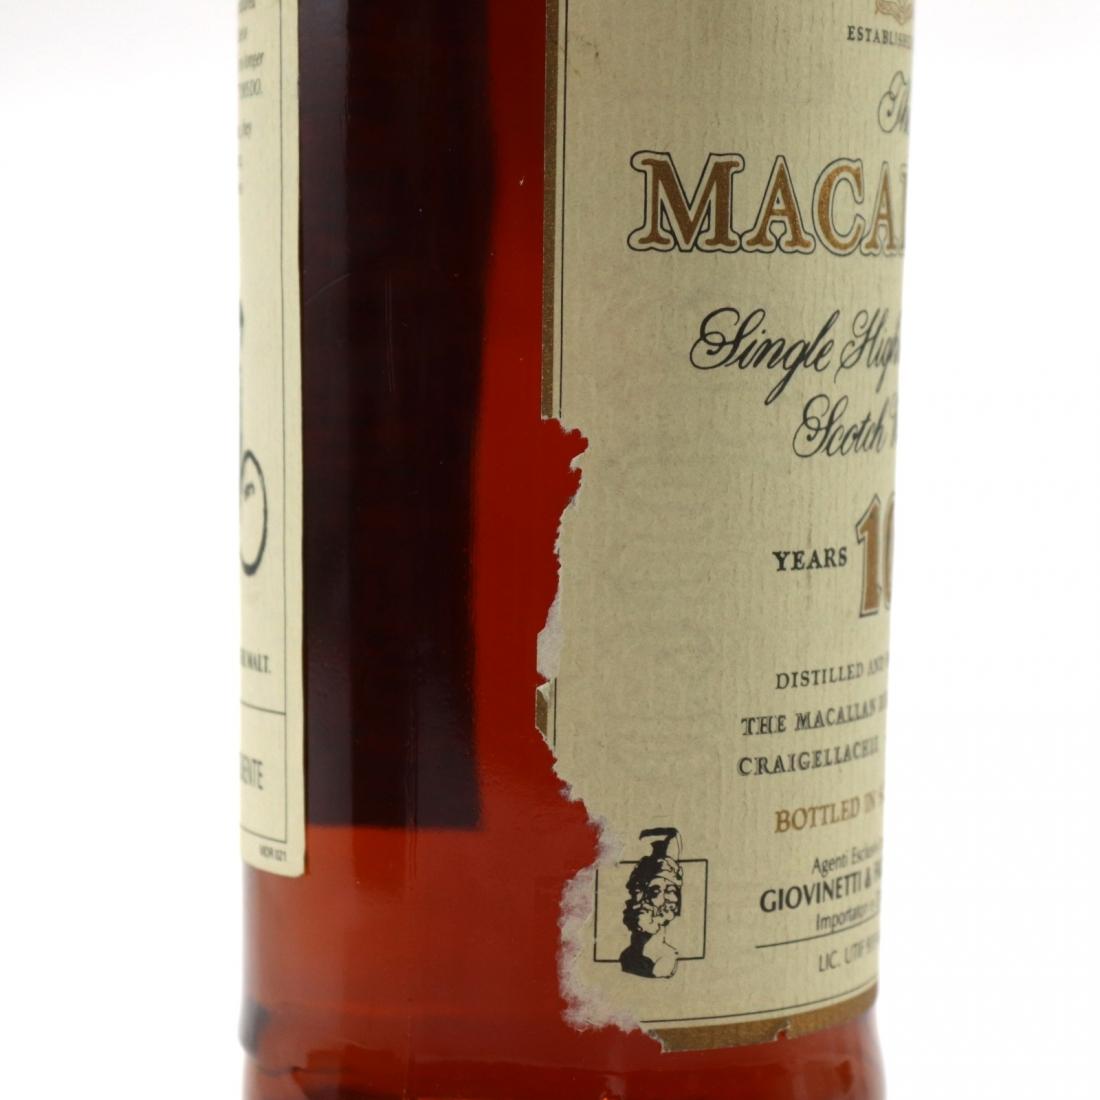 Macallan 10 Year Old 1990s / Giovinetti Import